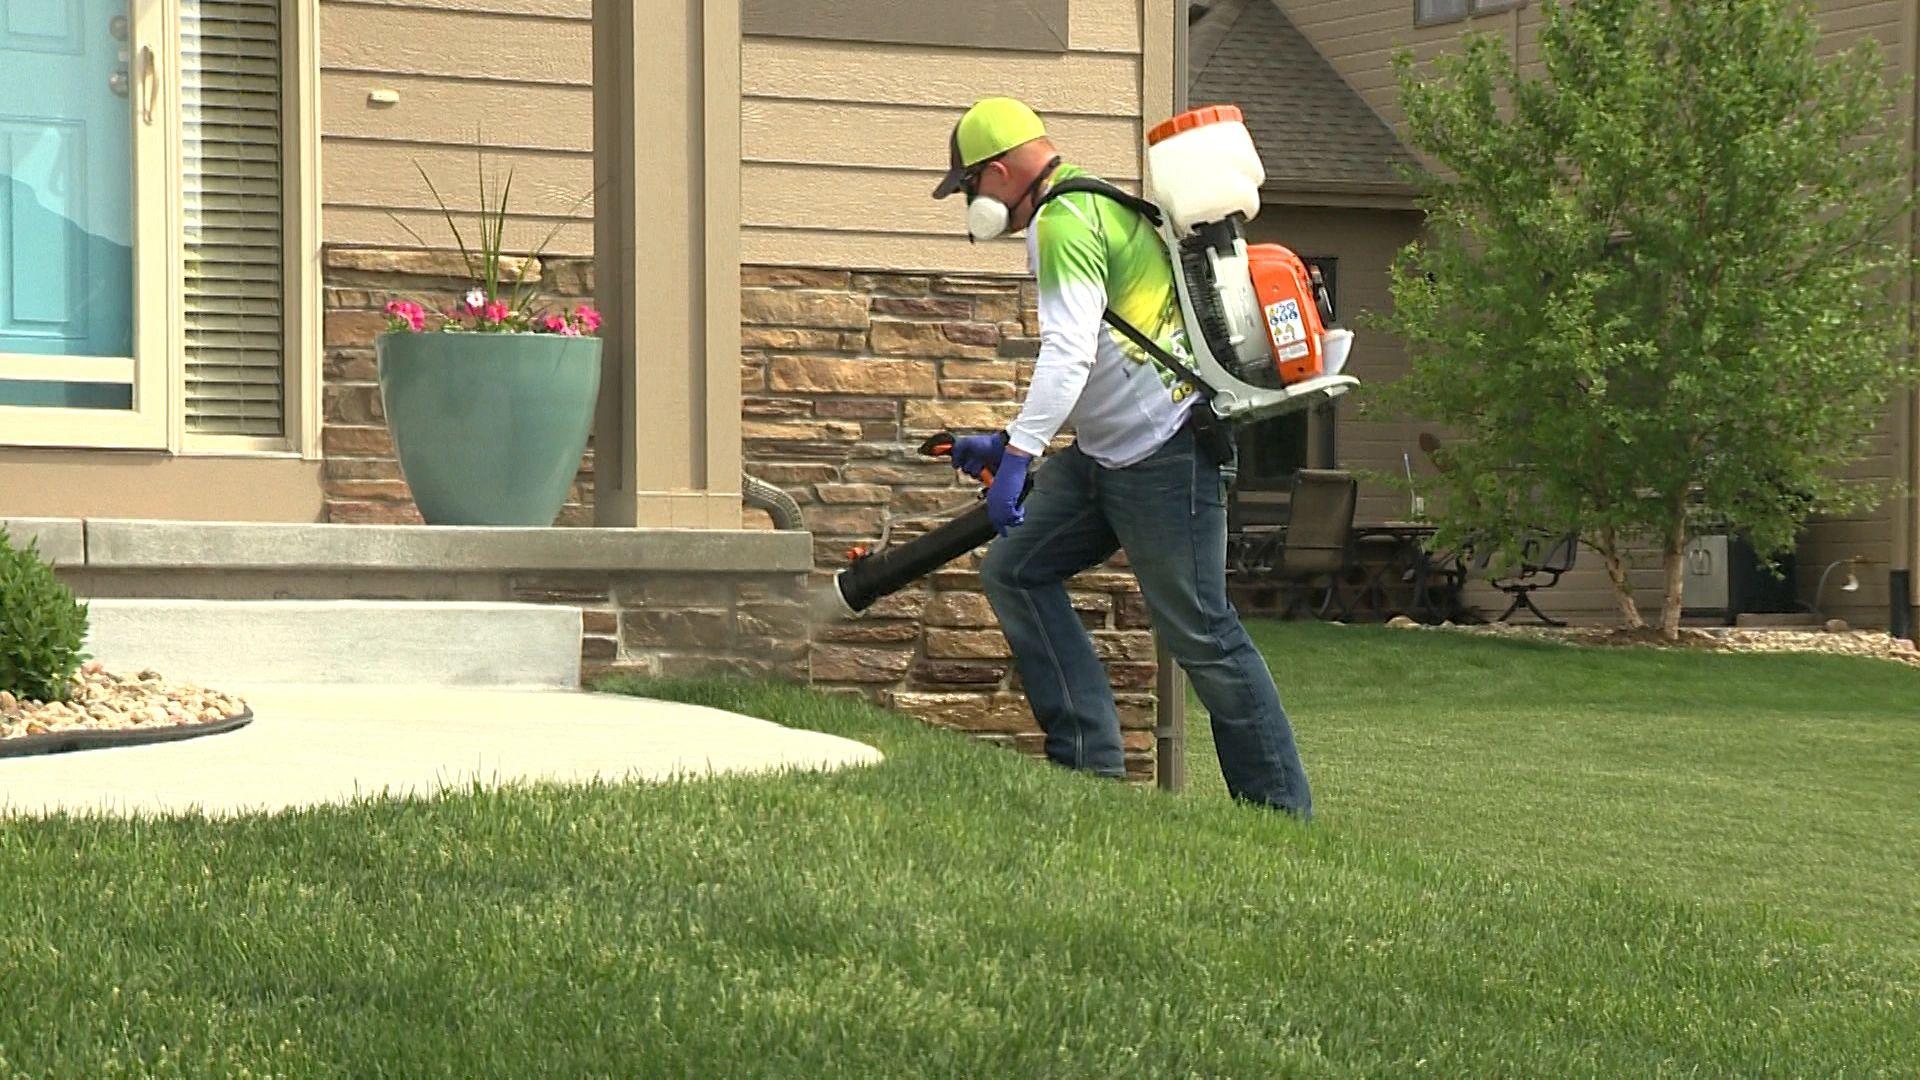 Pest Control & Bed Bug Exterminator Omaha NE | Ryan's Pest Solutions